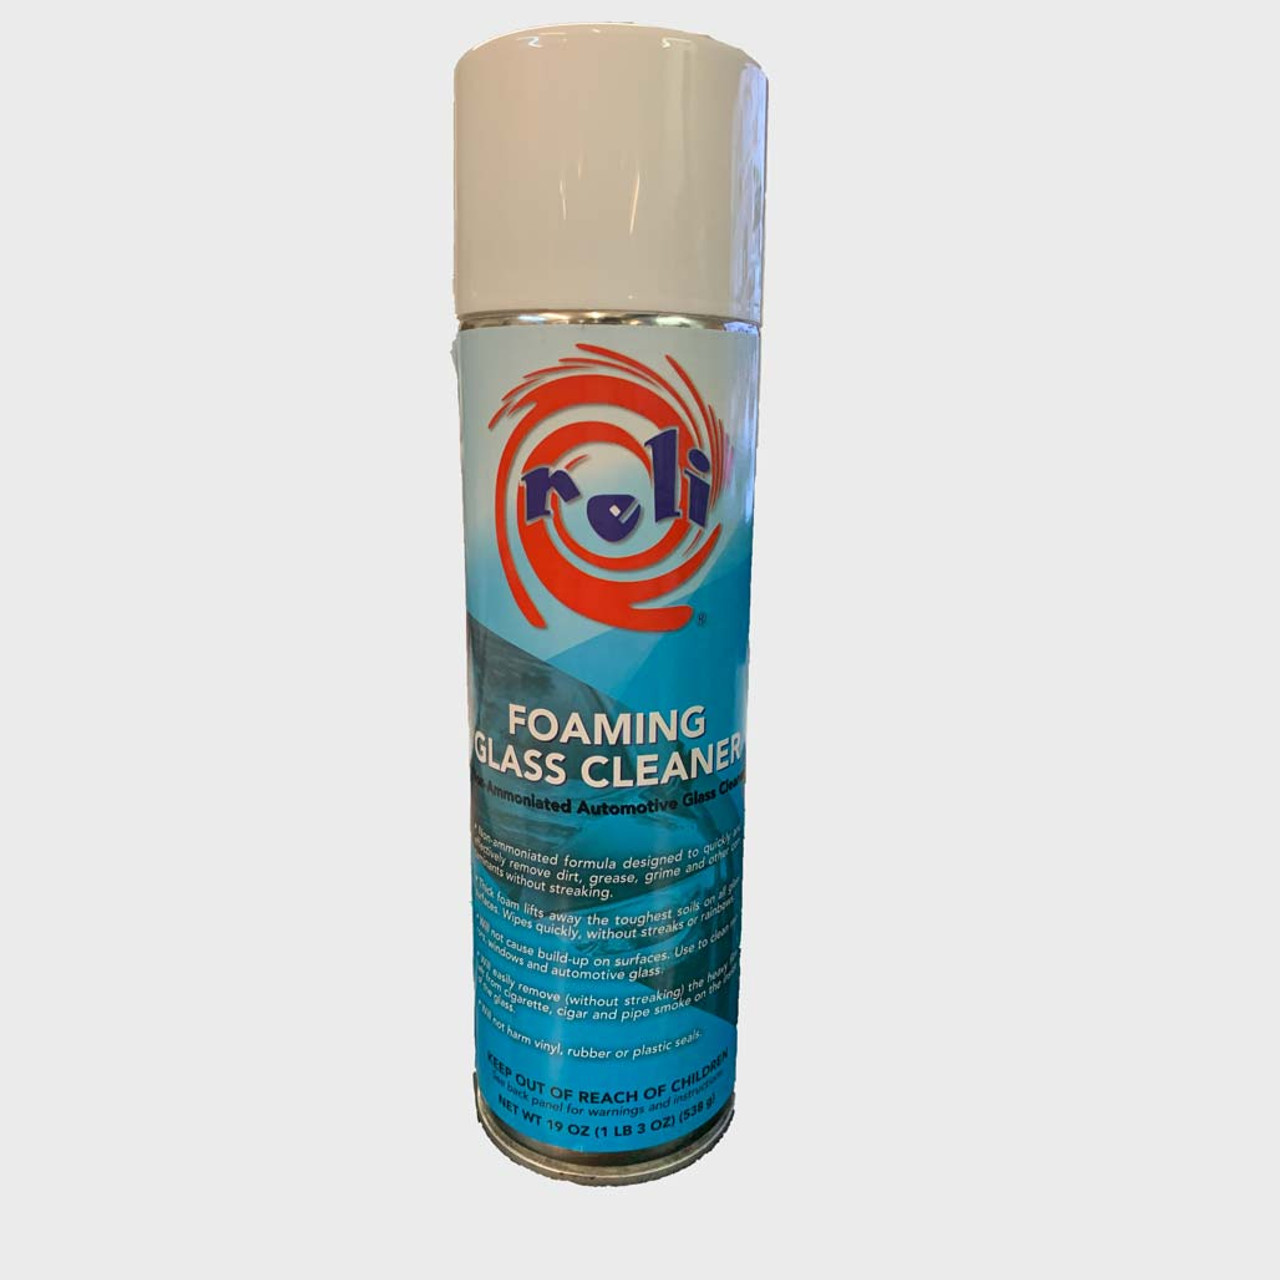 Foaming Dlass Cleaner   Shinerz ShowCar